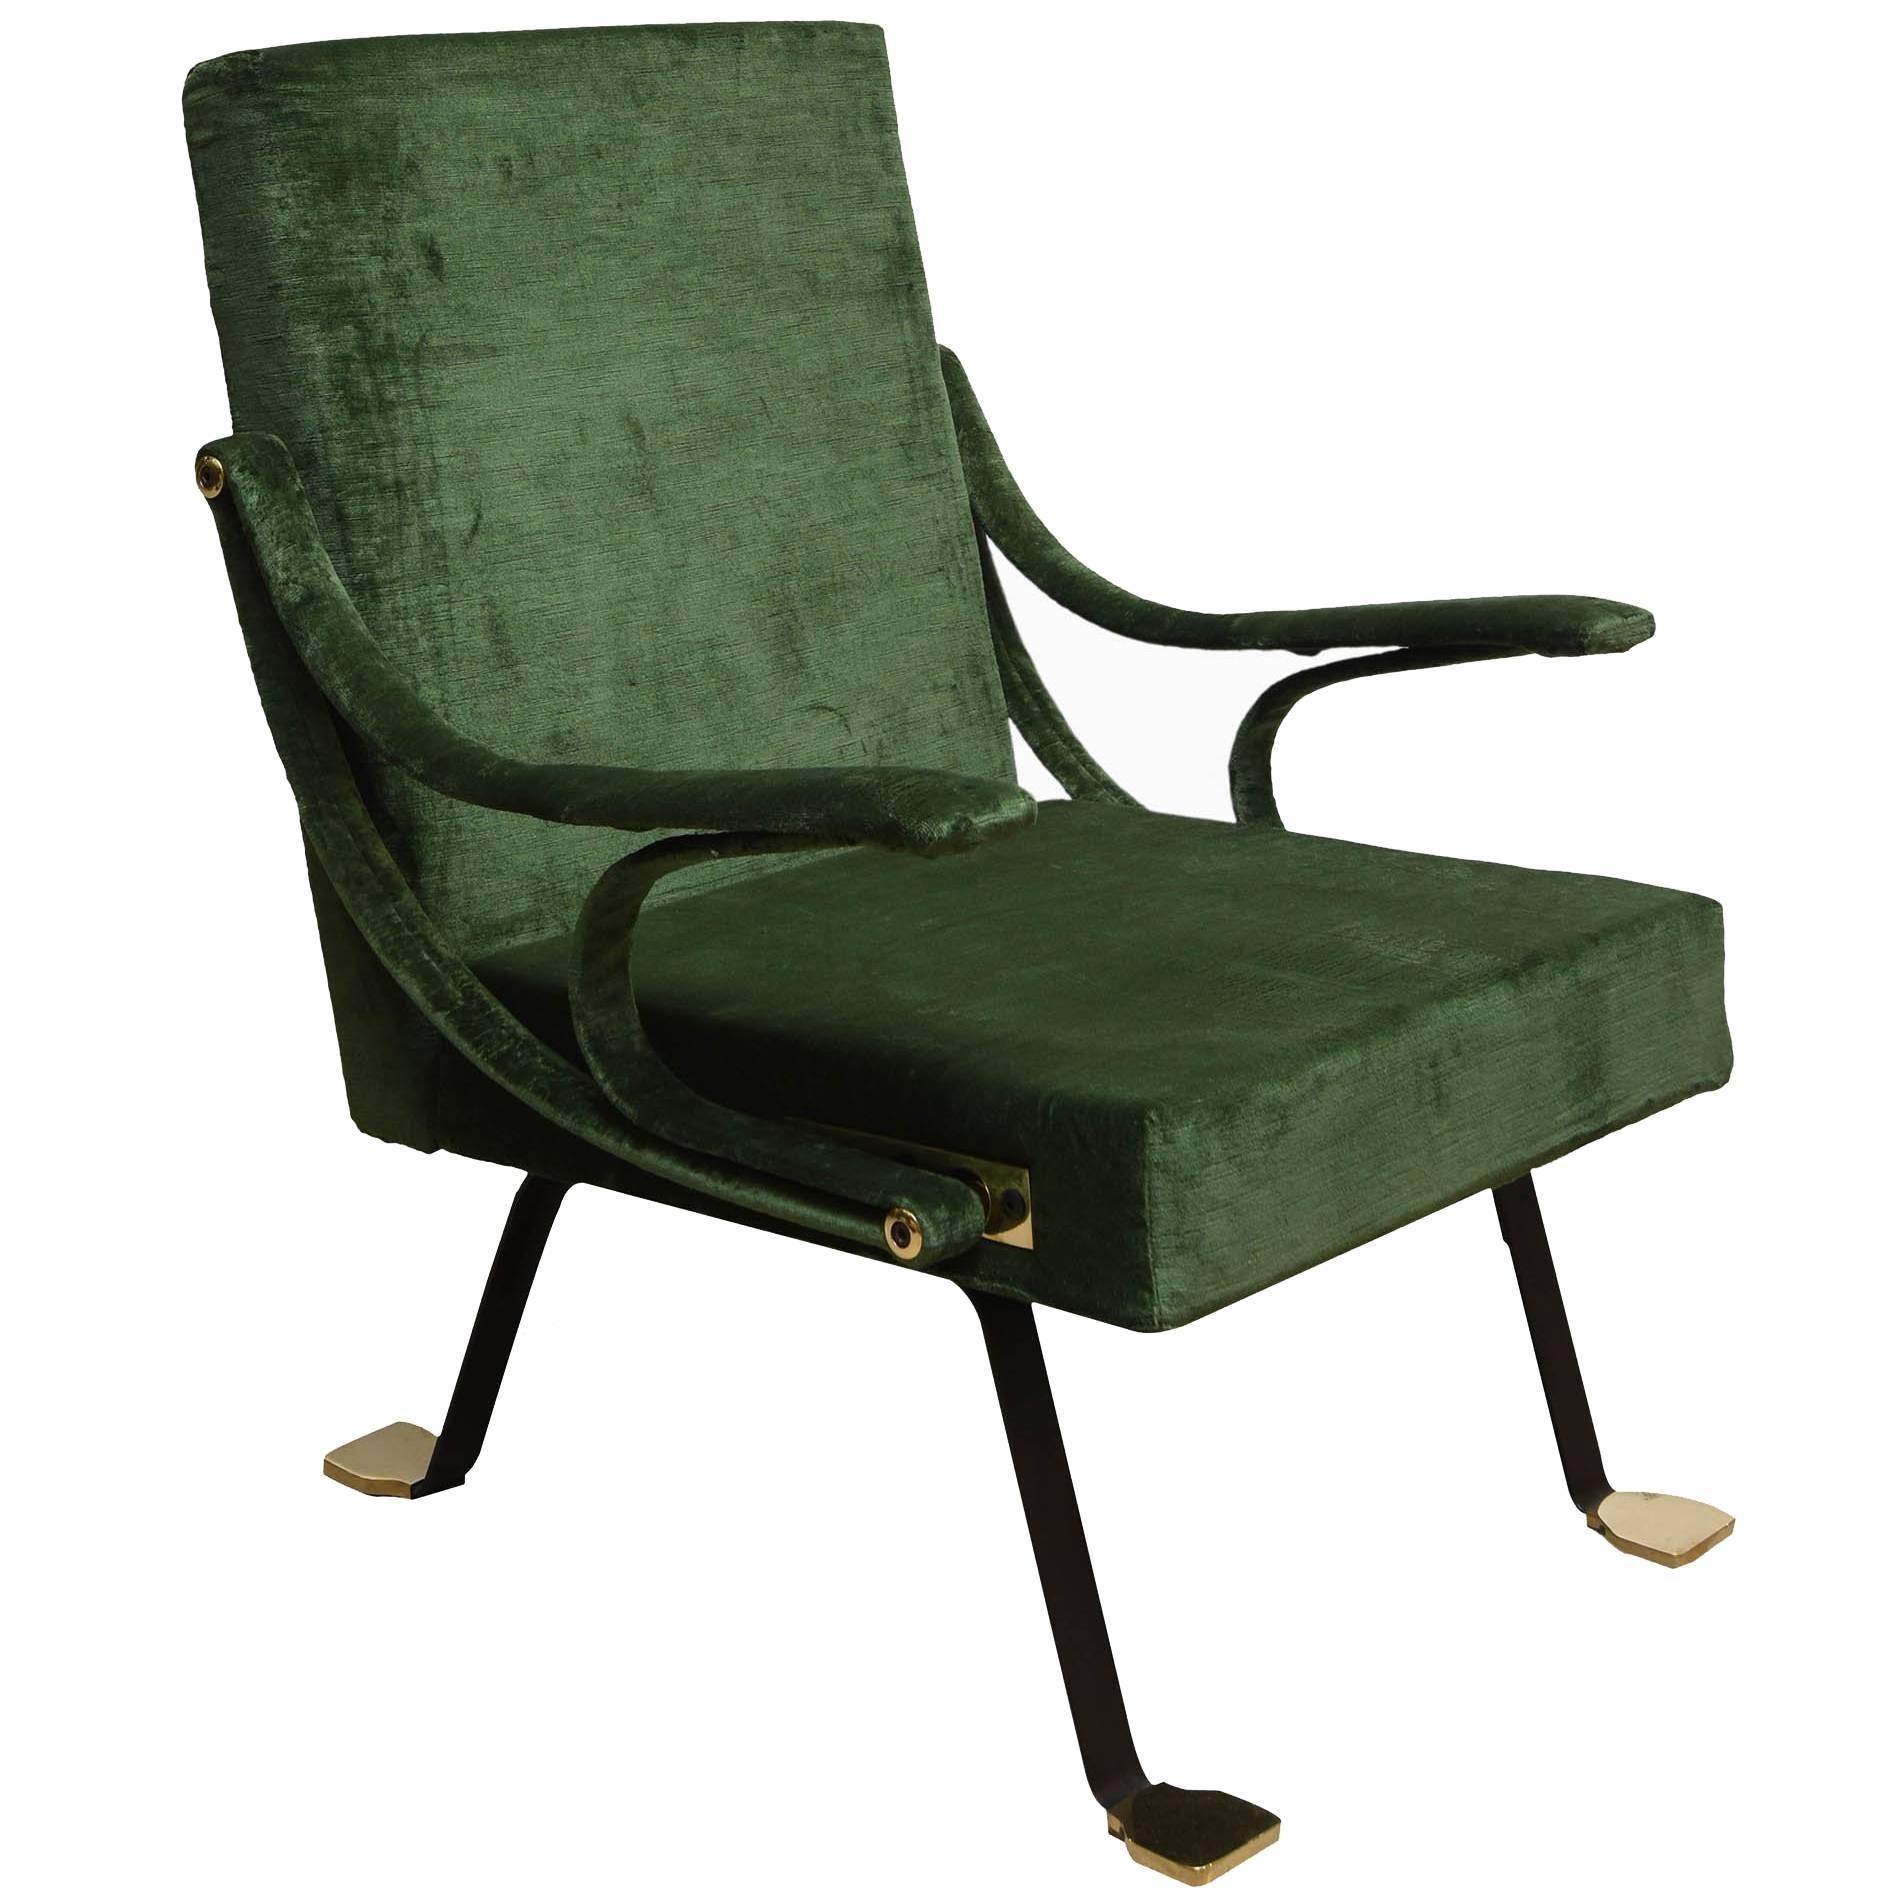 1950s U0026quot;Digammau0026quot; Ignazio Gardella Gavina Green Armchair